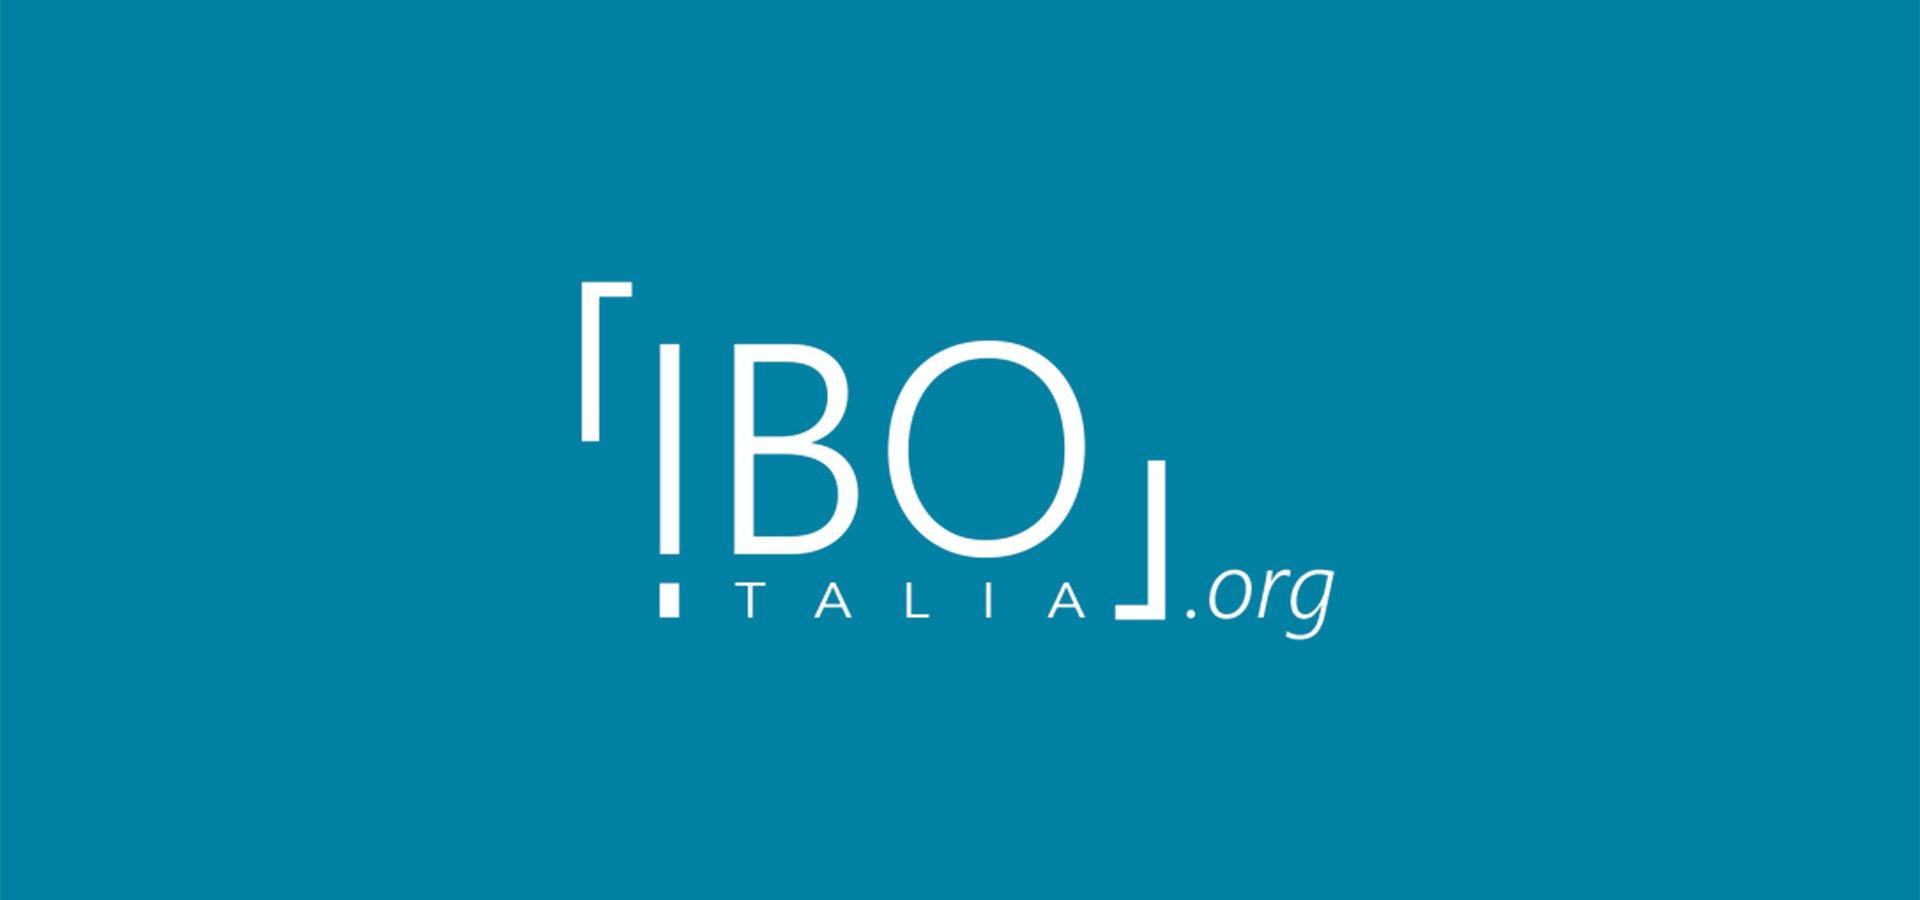 nuovo logo ibo italia home